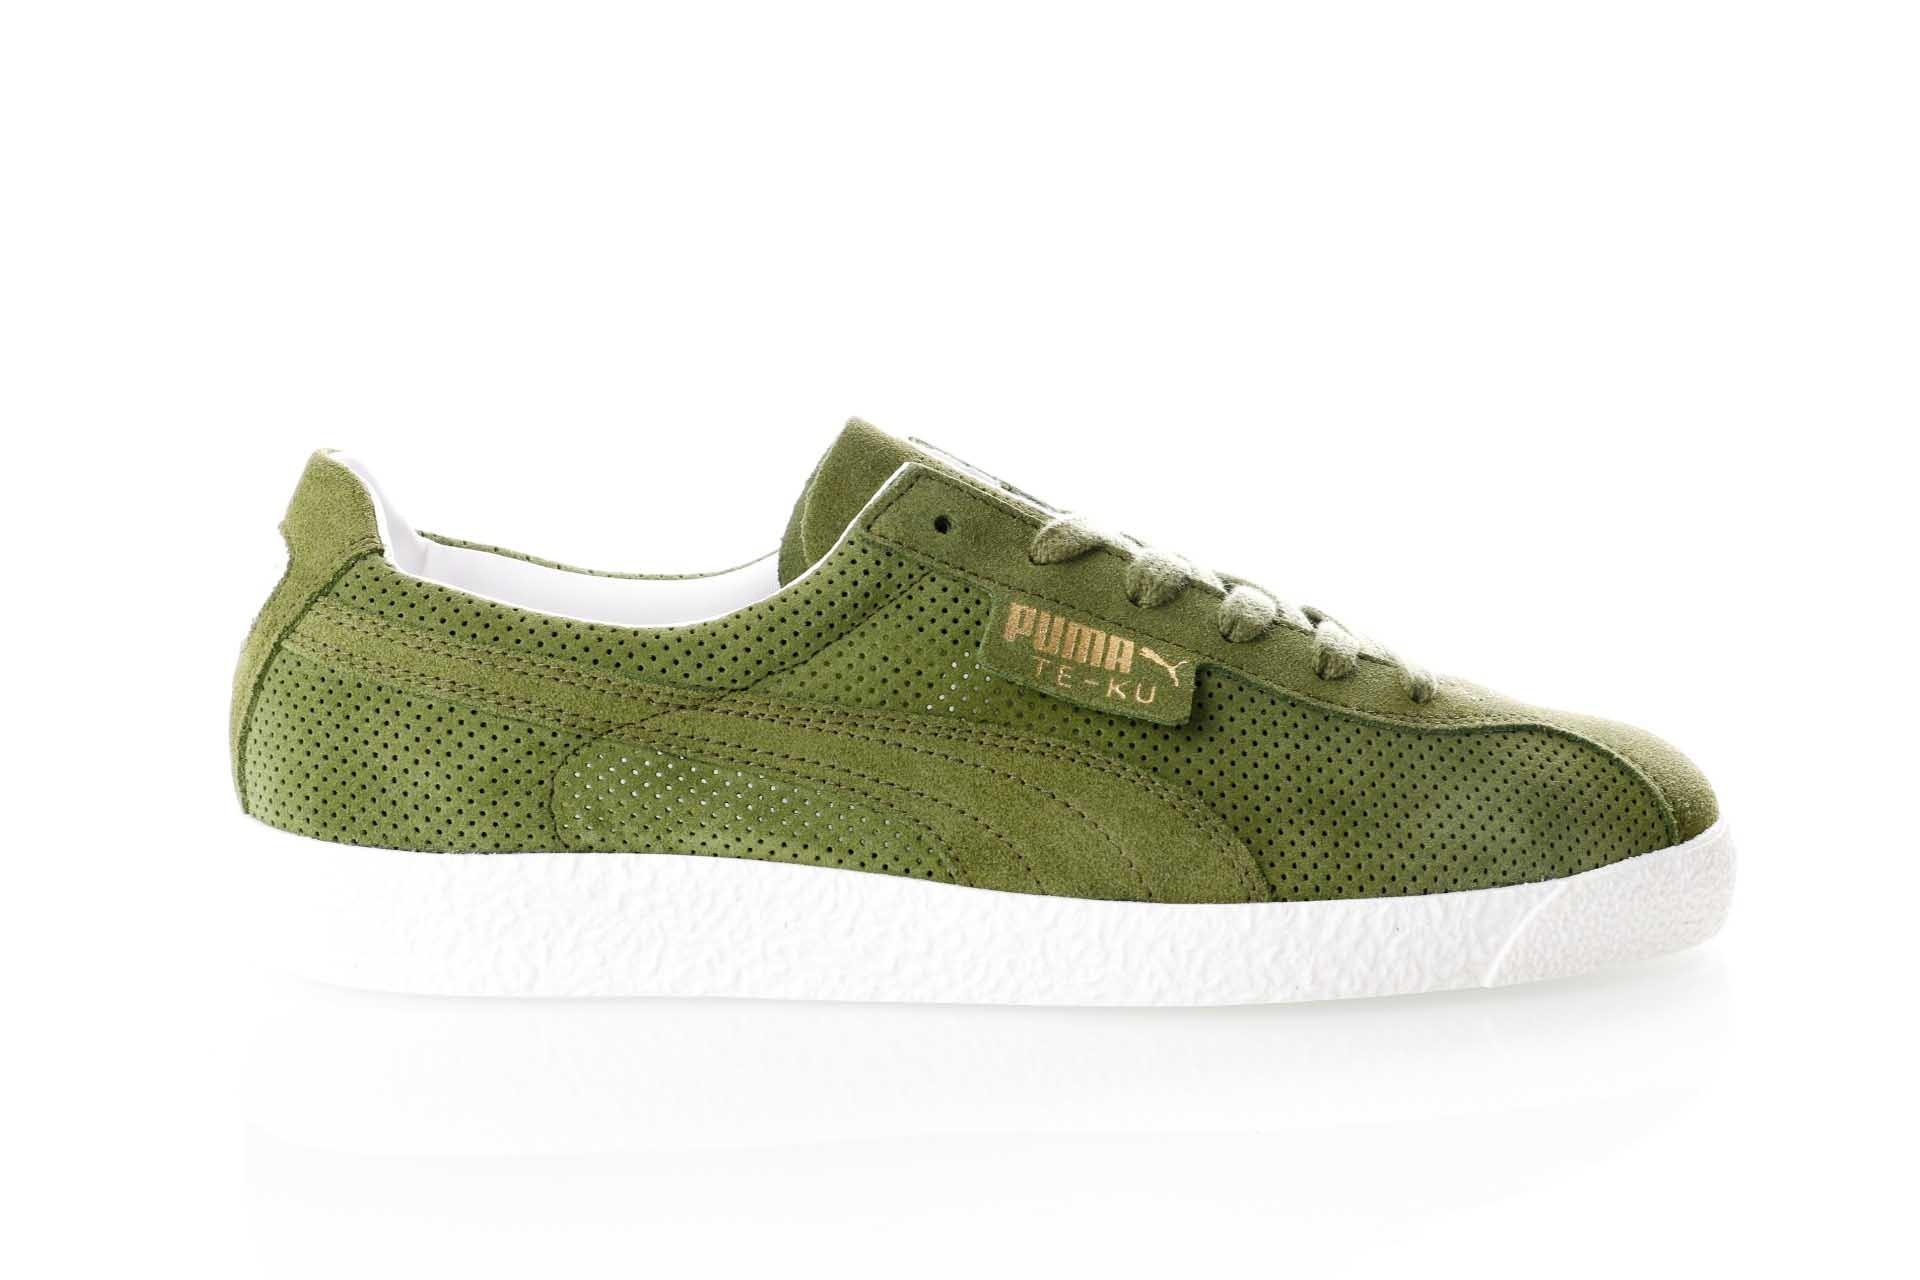 Foto van Puma Te-Ku Summer 365422 05 Sneakers Olive-Capulet Olive